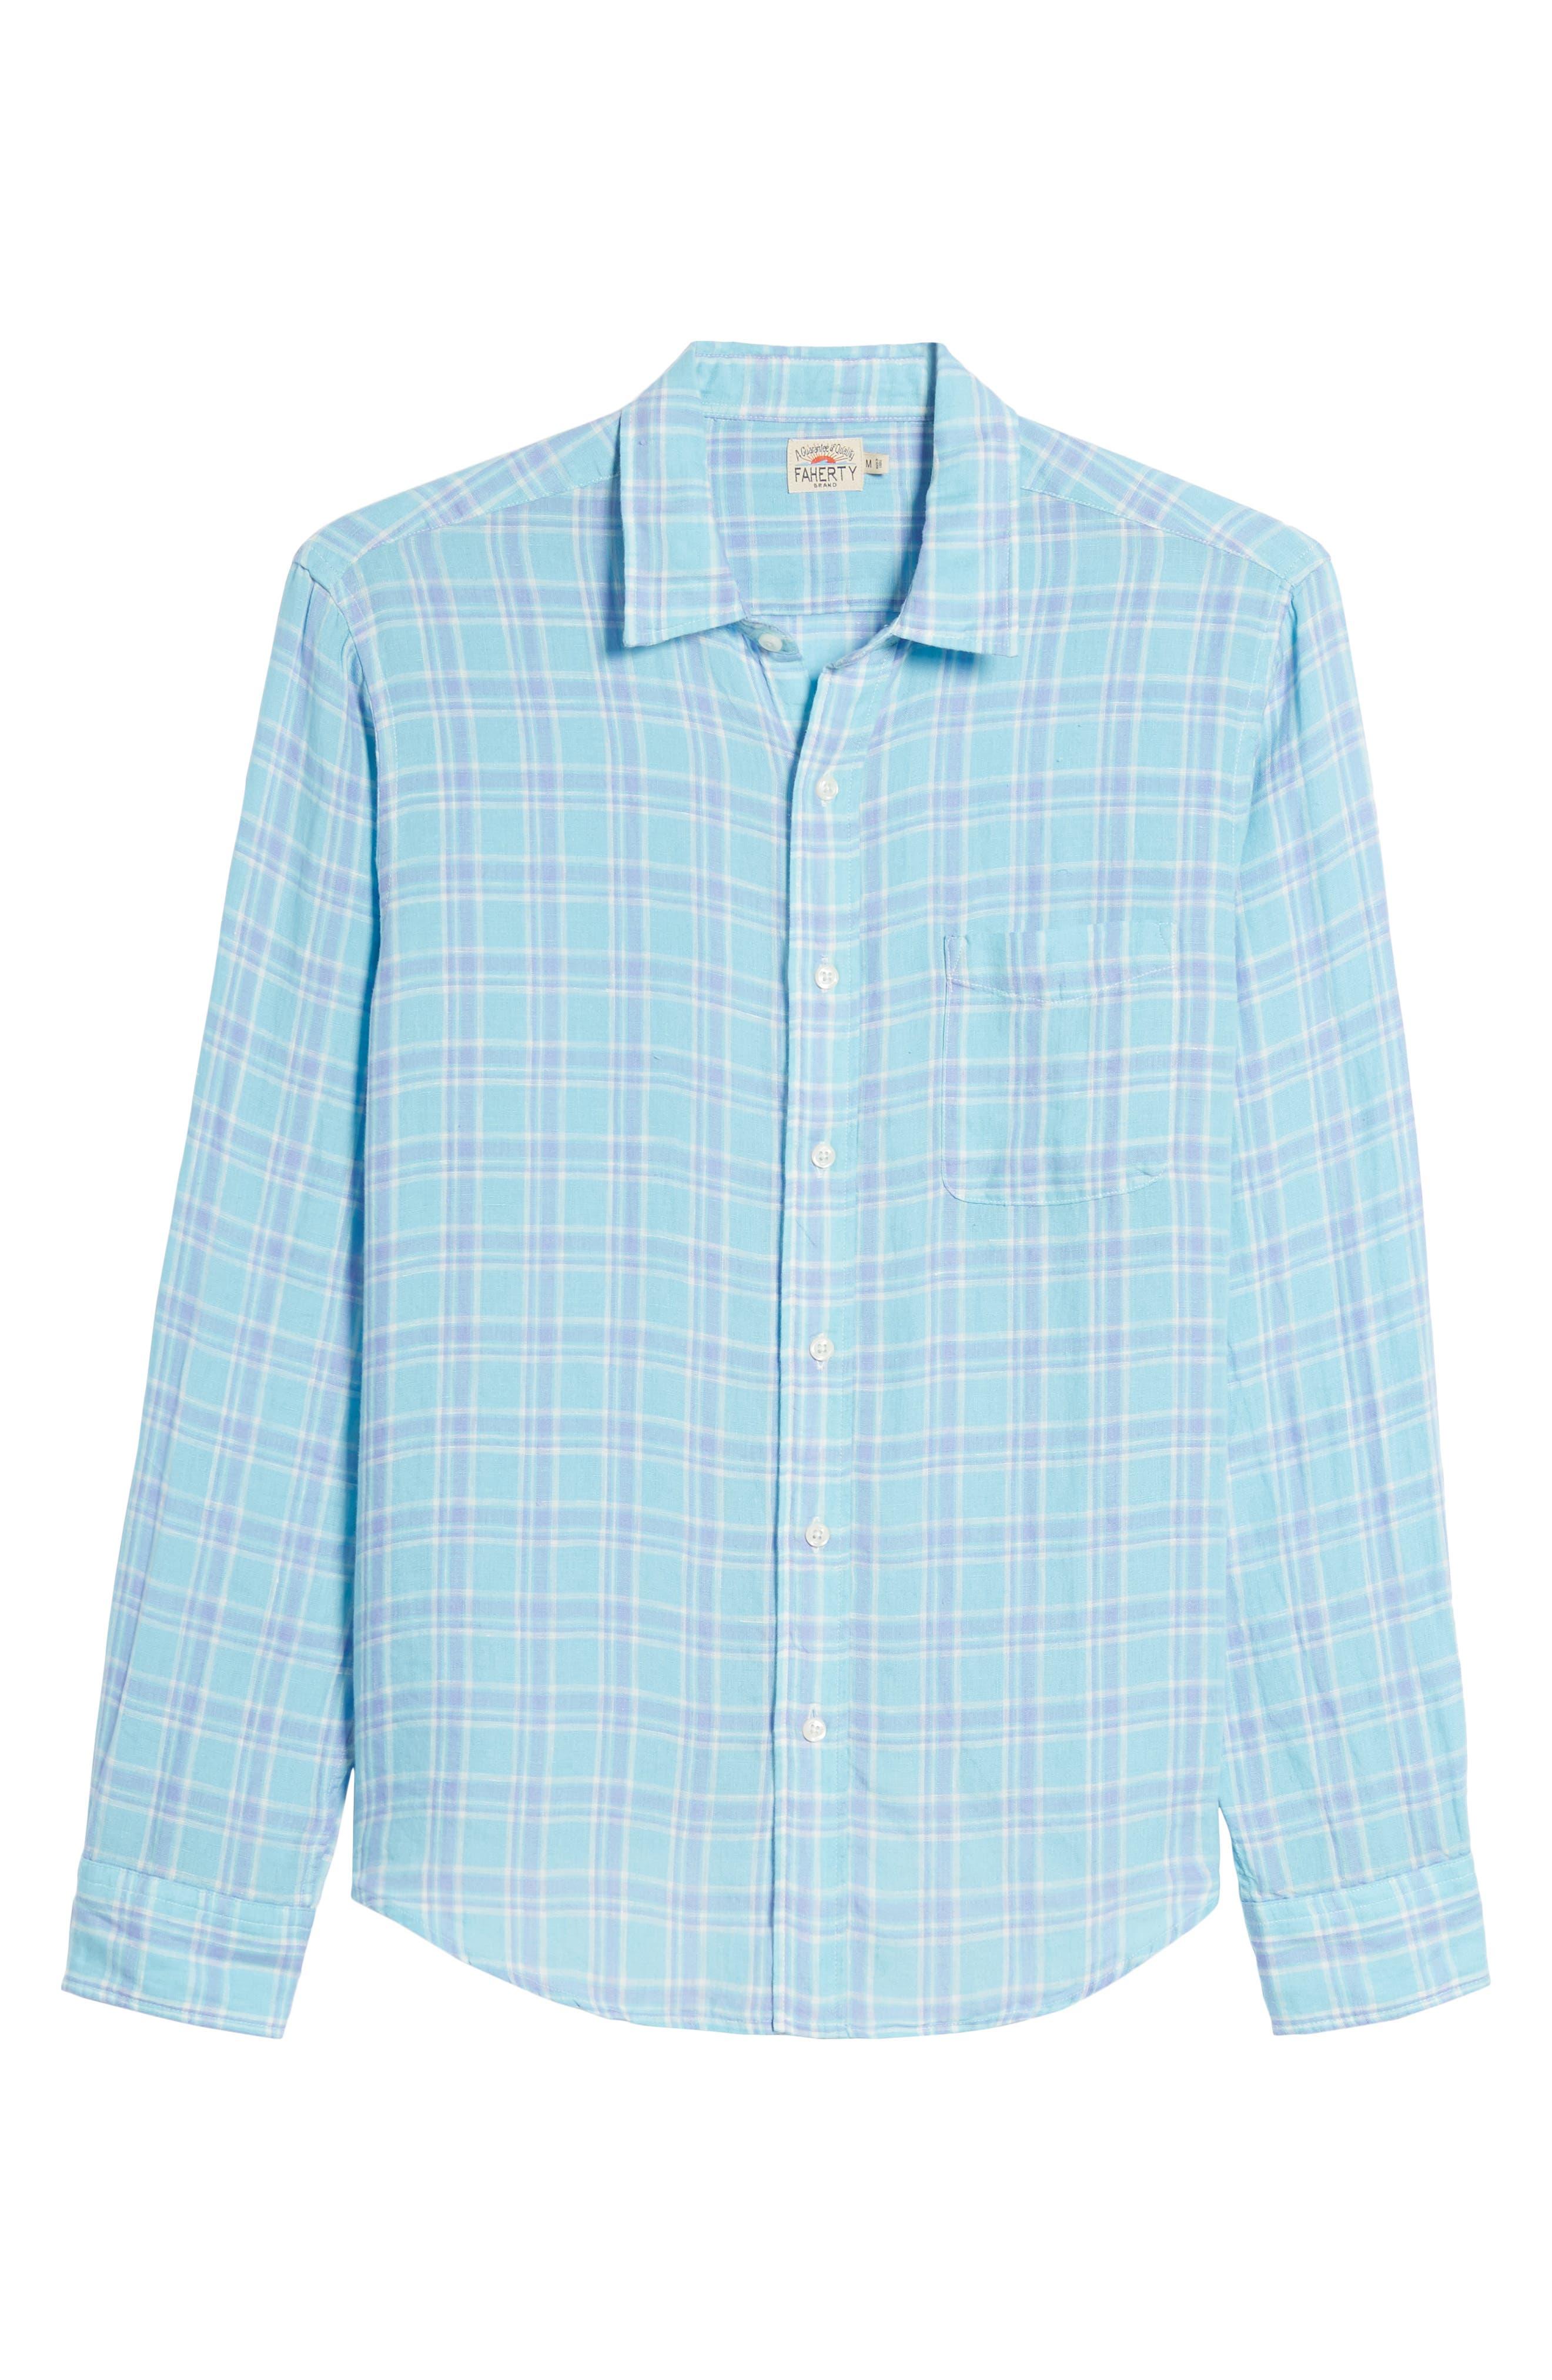 Ventura Plaid Linen Sport Shirt,                             Alternate thumbnail 6, color,                             Teal Purple Plaid